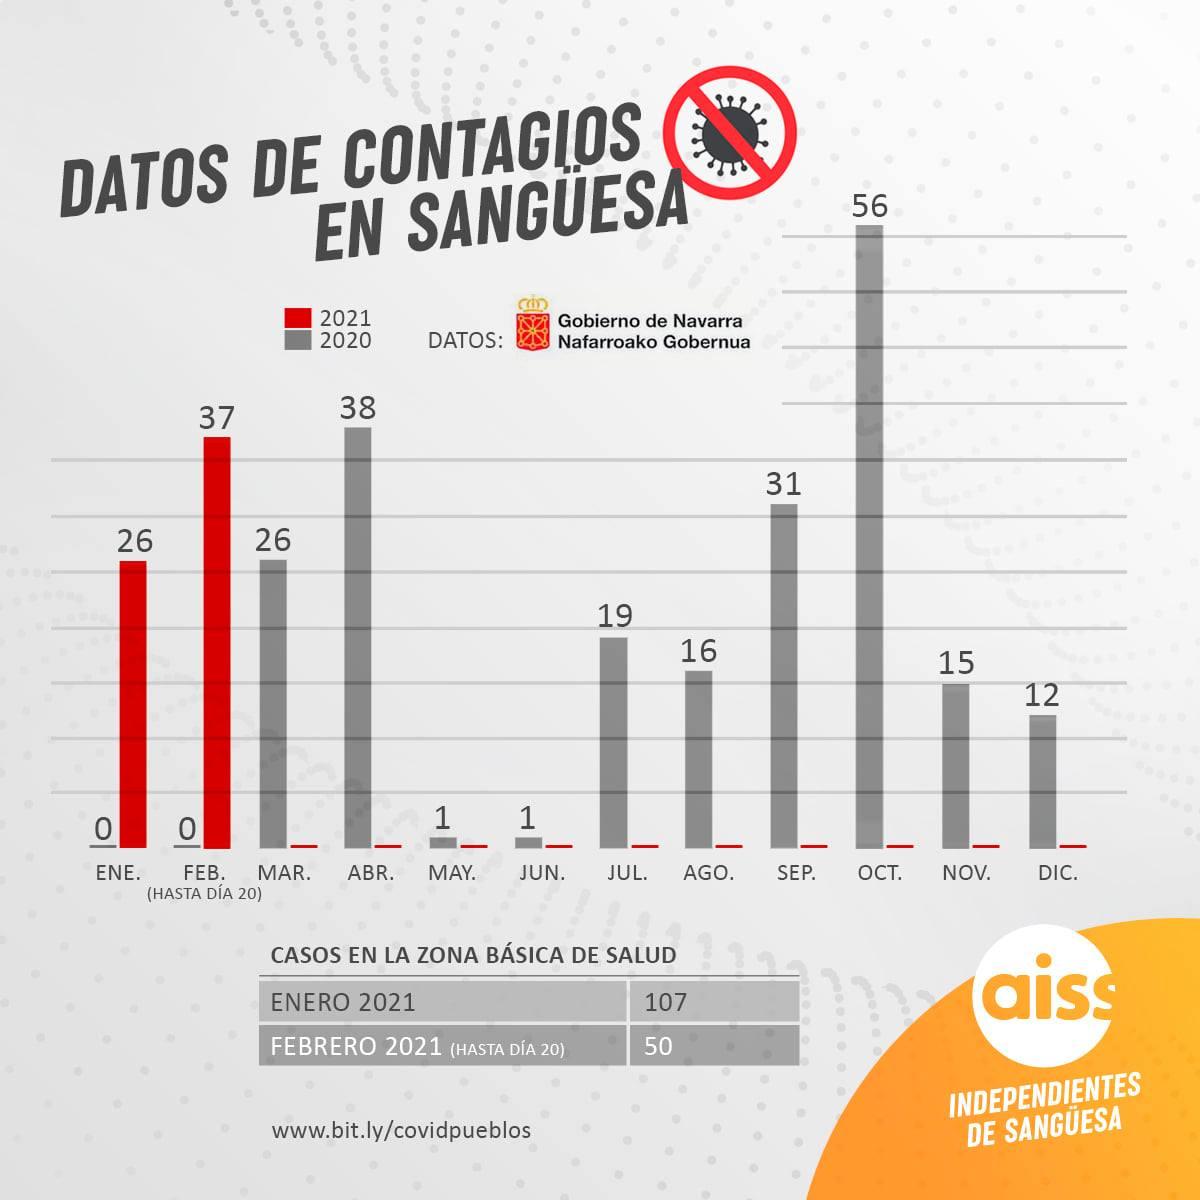 Sangüesa suma 37 casos de Covid-19, acercándose a los datos de abril 2020